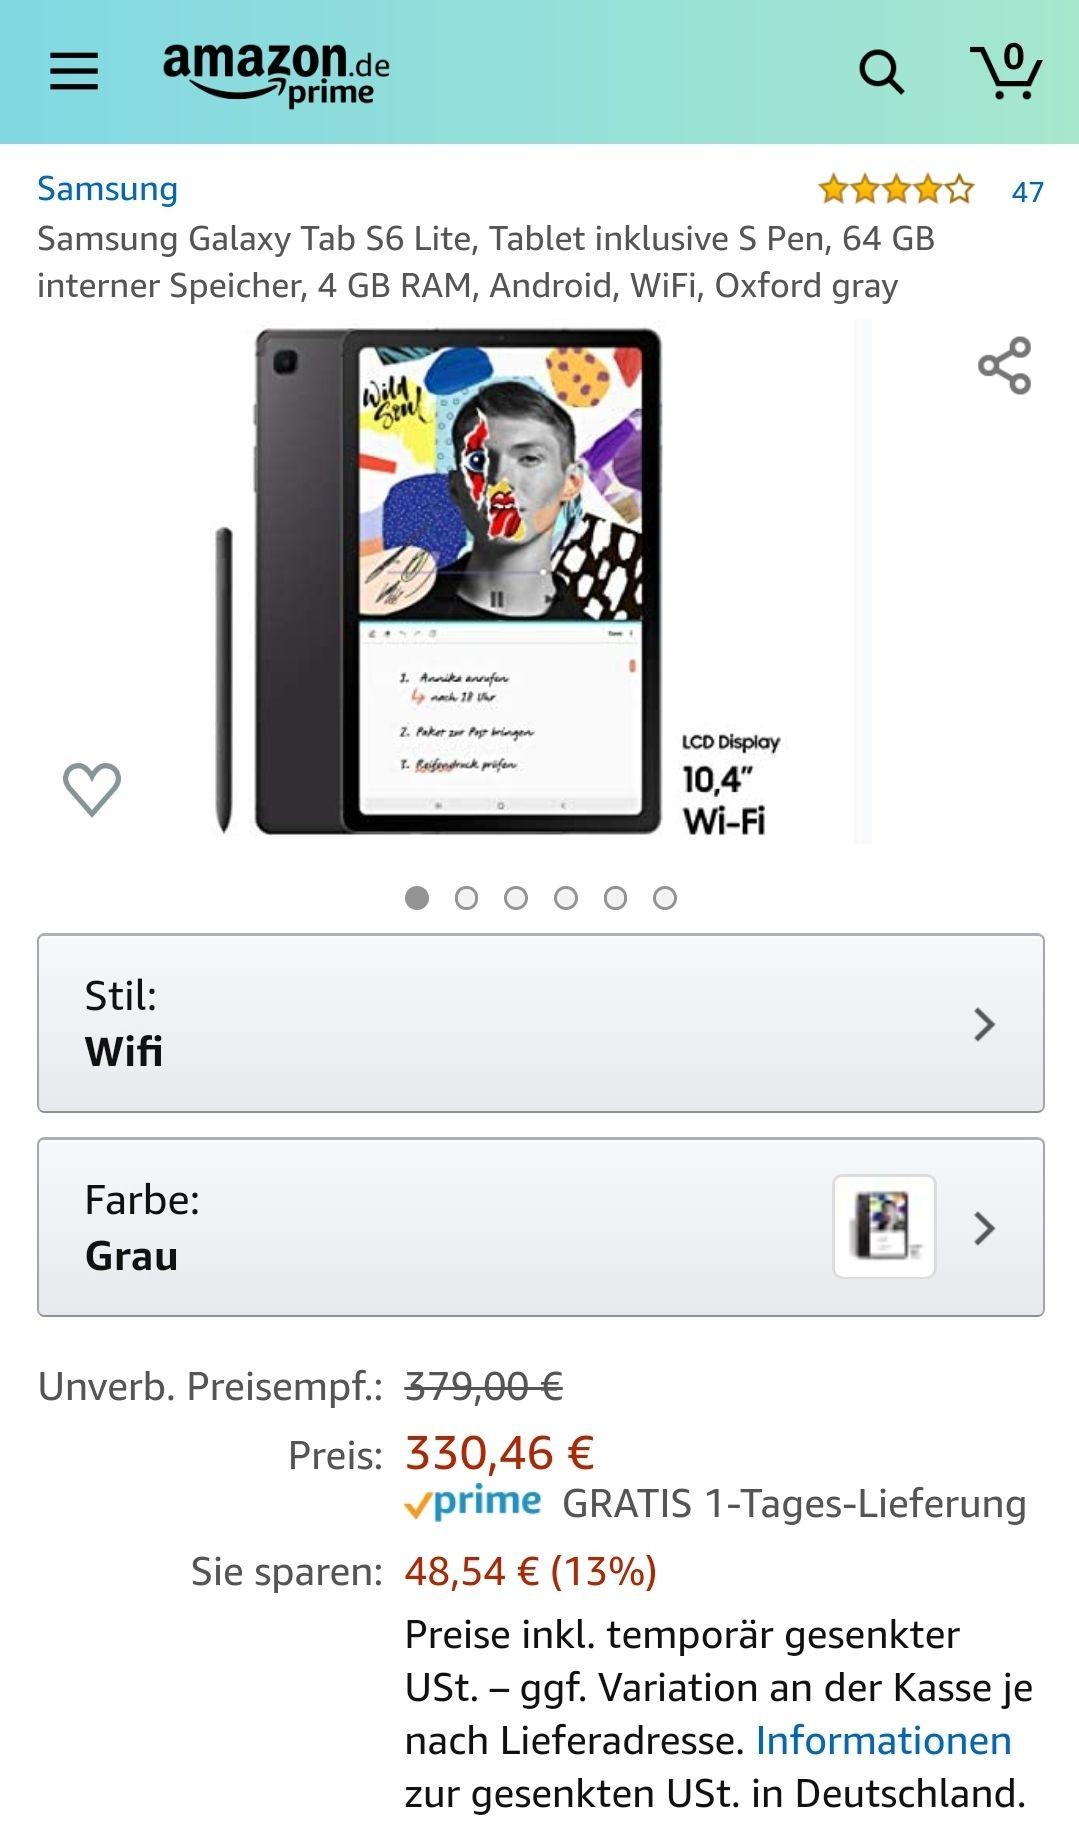 Samsung GalaxyTabS6Lite,Tablet inklusive S Pen, 64 GB interner Speicher, 4 GB RAM, Android, WiFi,